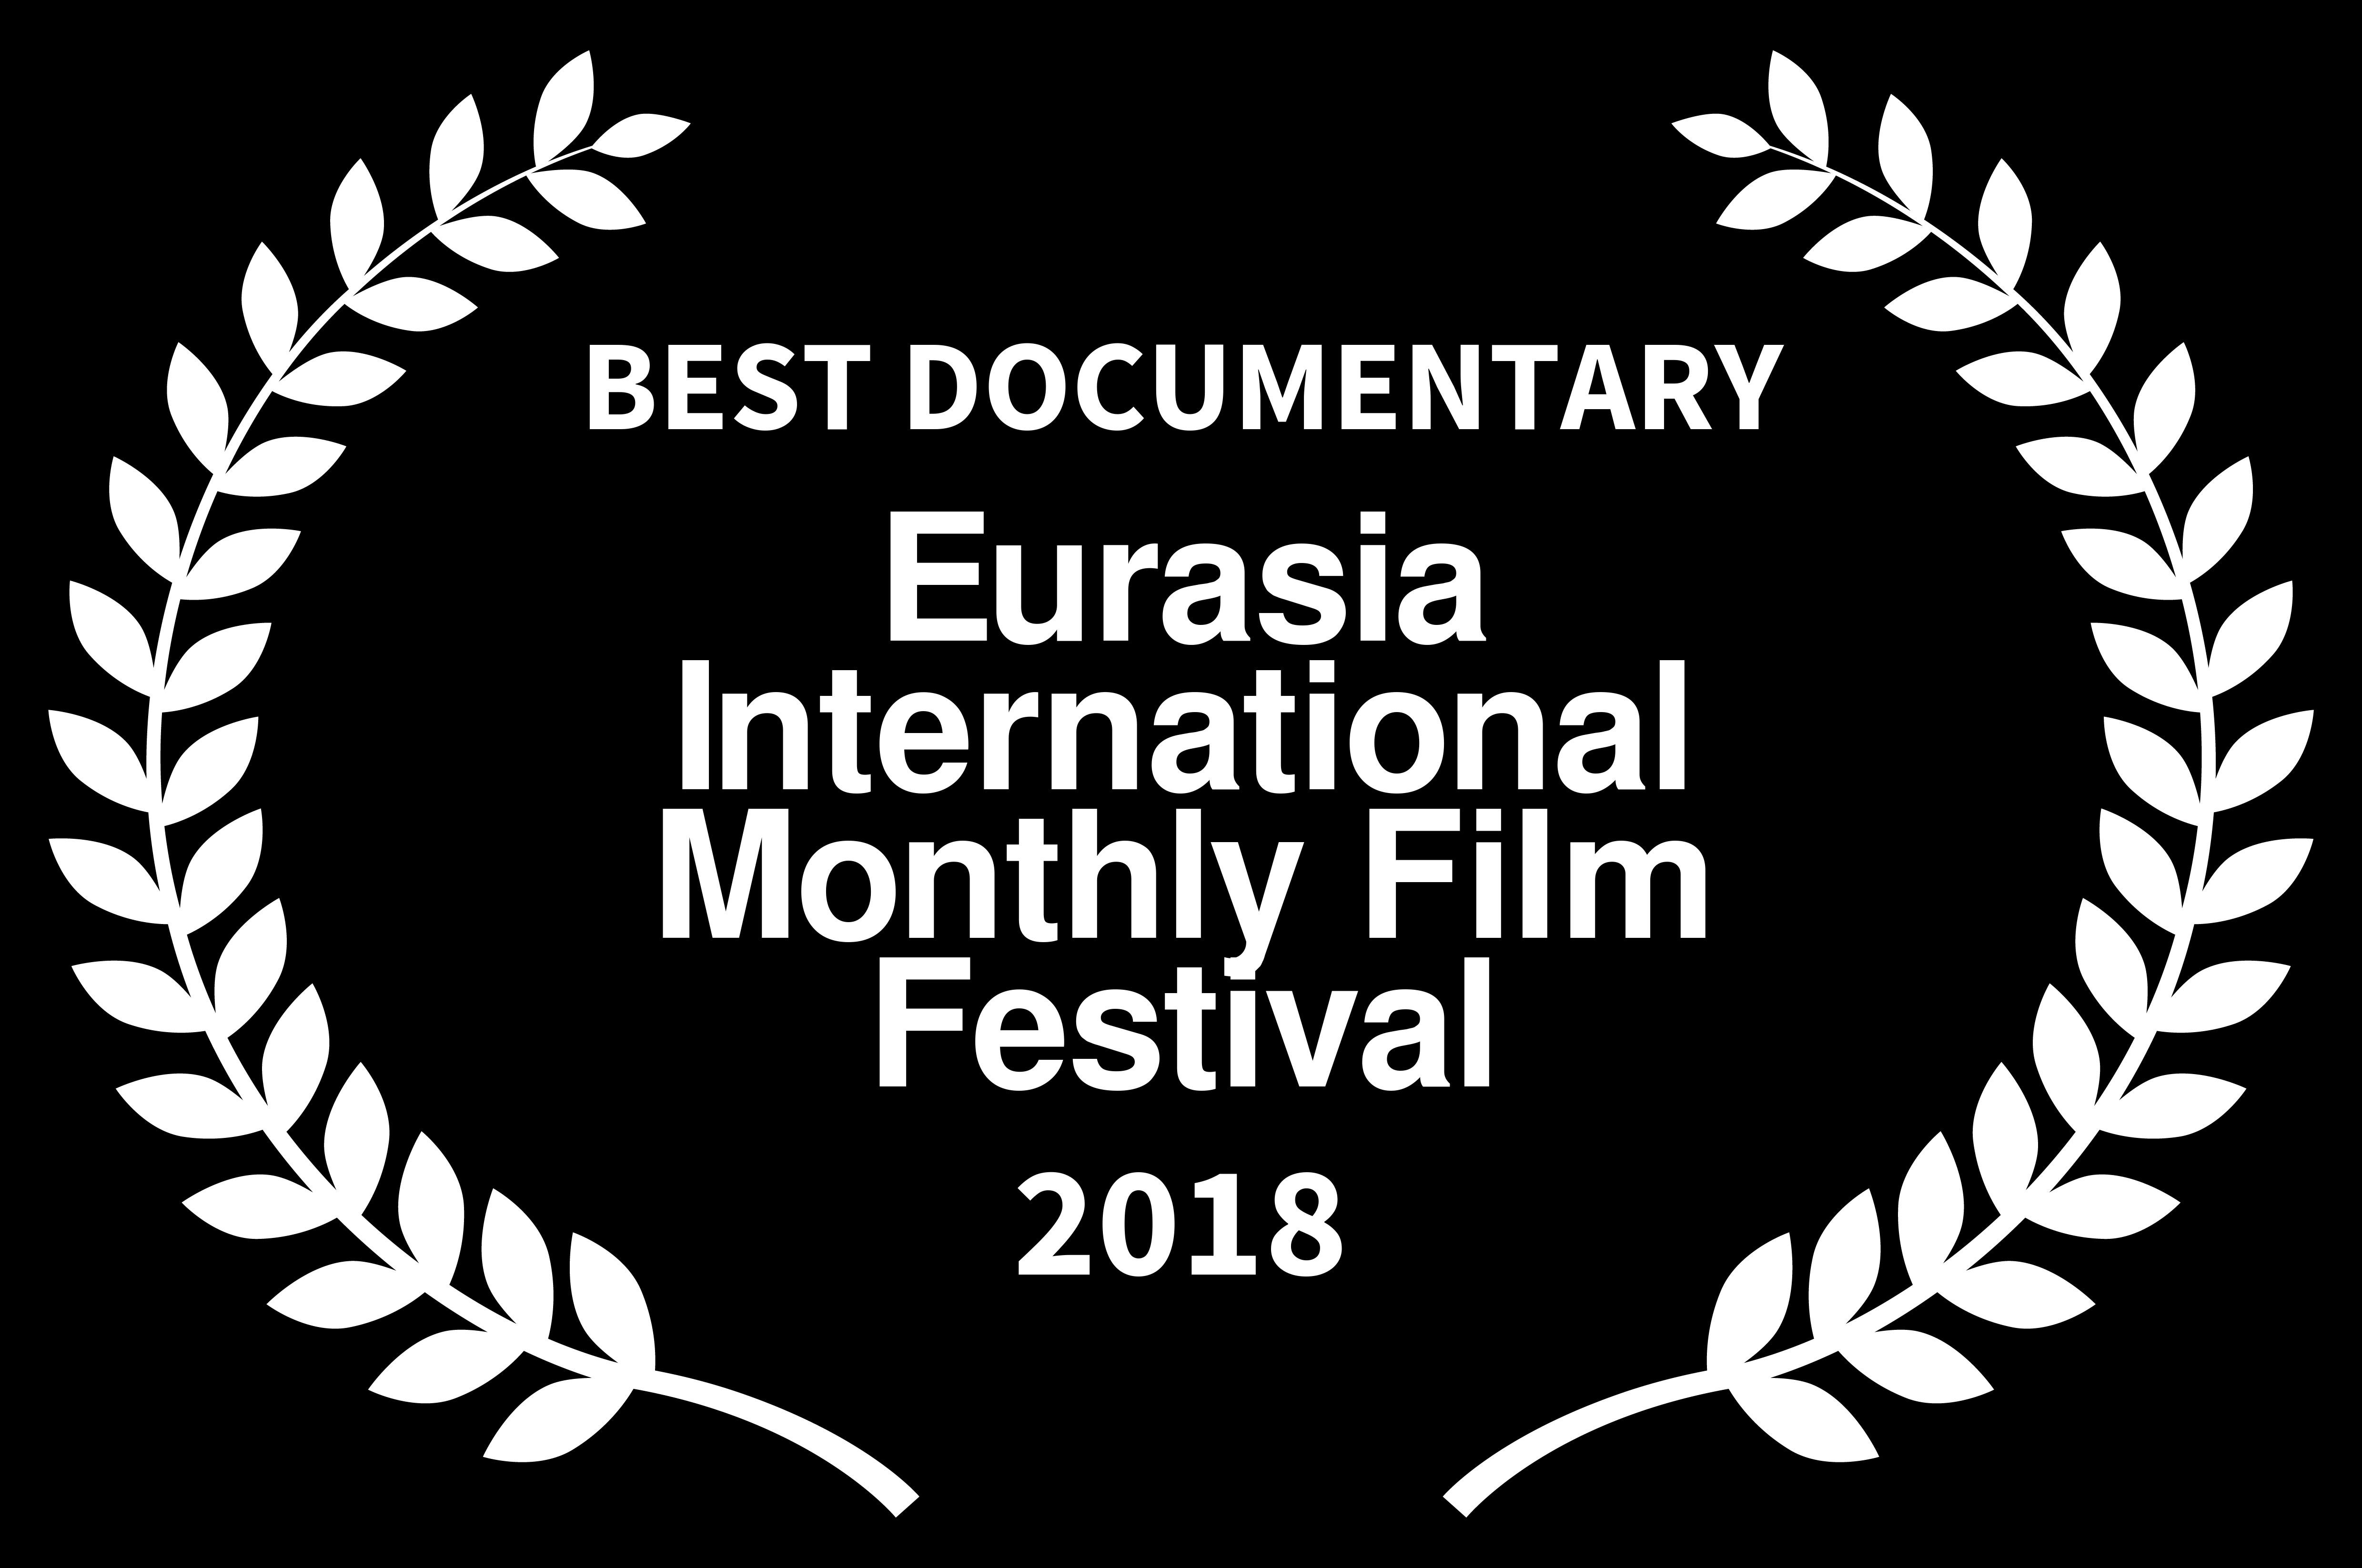 BEST_DOCUMENTARY award Operation Wedding anat zalmanson kuznetsov eurasia 2018 black